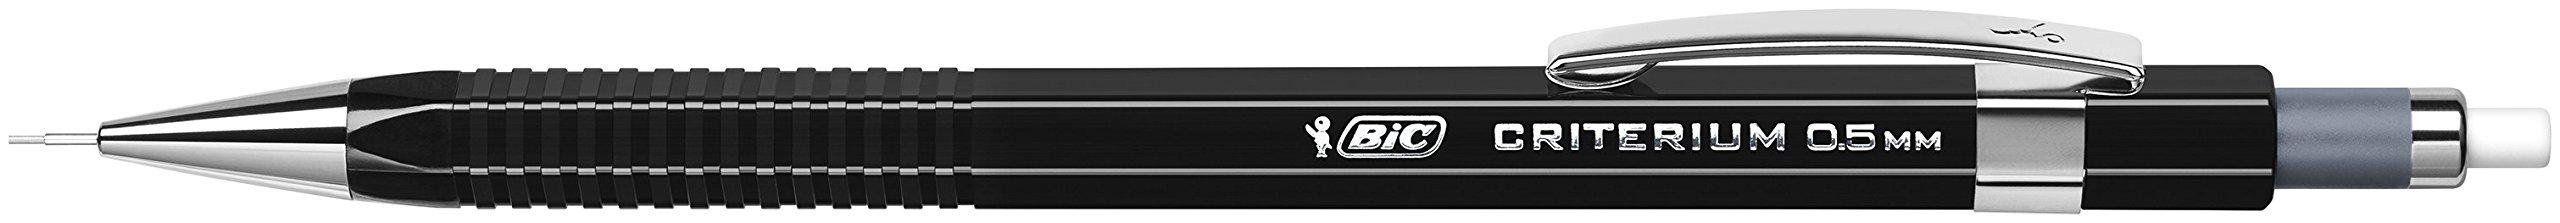 BIC Criterium Portaminas 0,5mm HB – Negro, Blíster de 1 + 1 Estuche de 12 Minas